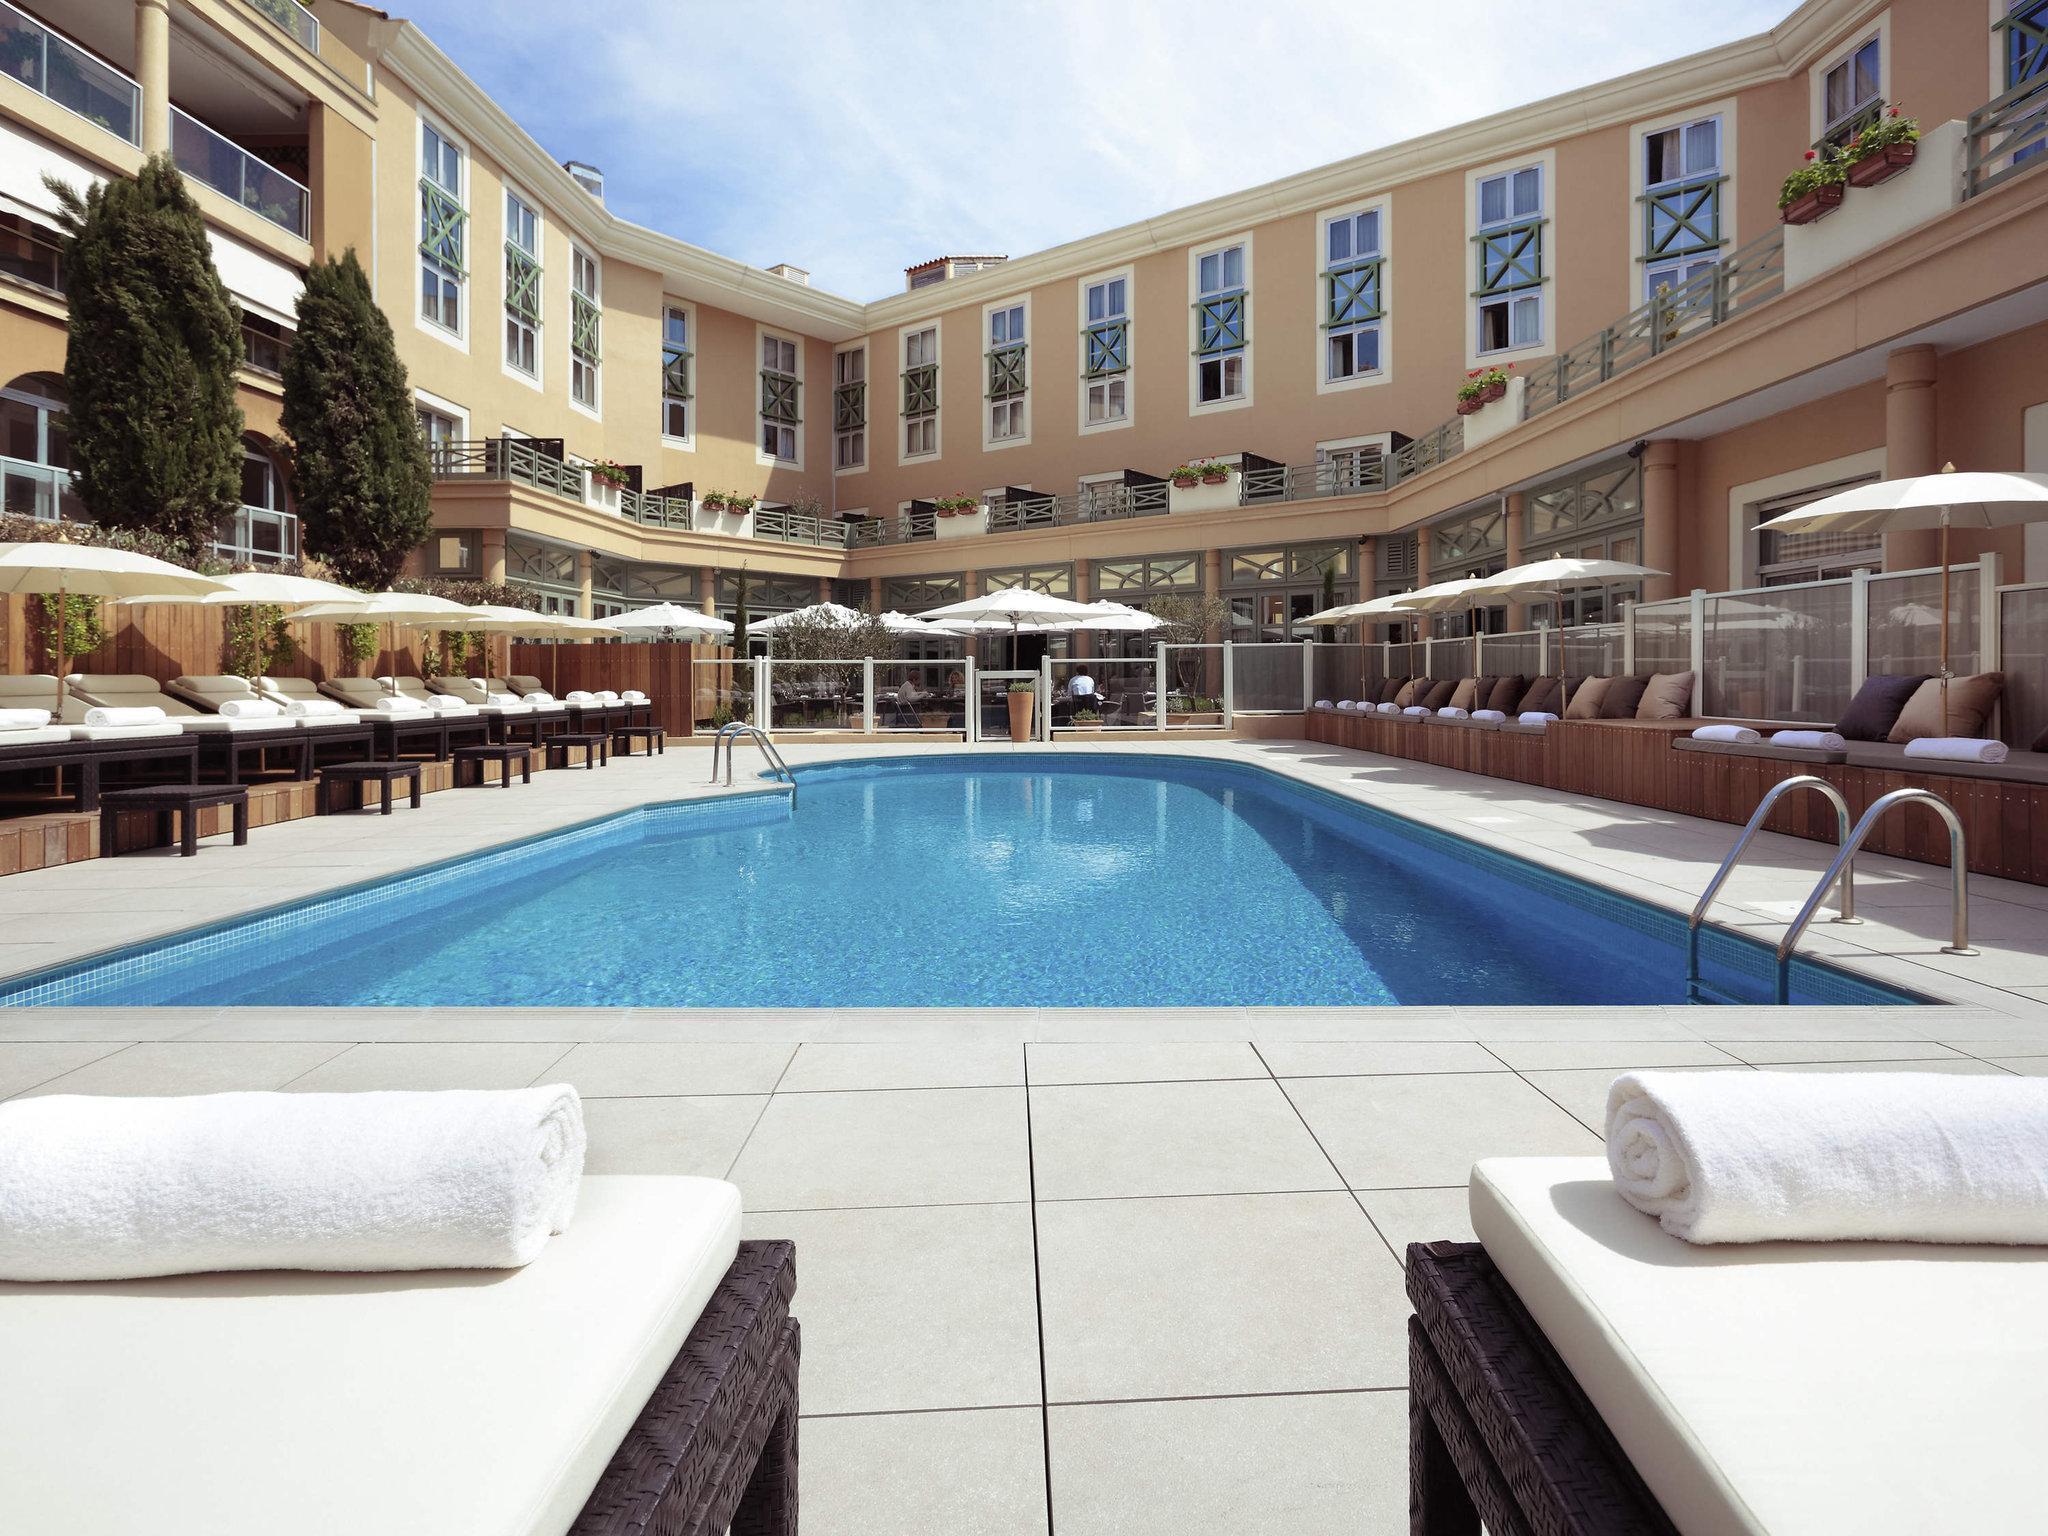 Grand Hotel Roi Rene Aix-en-Provence Centre - MGallery